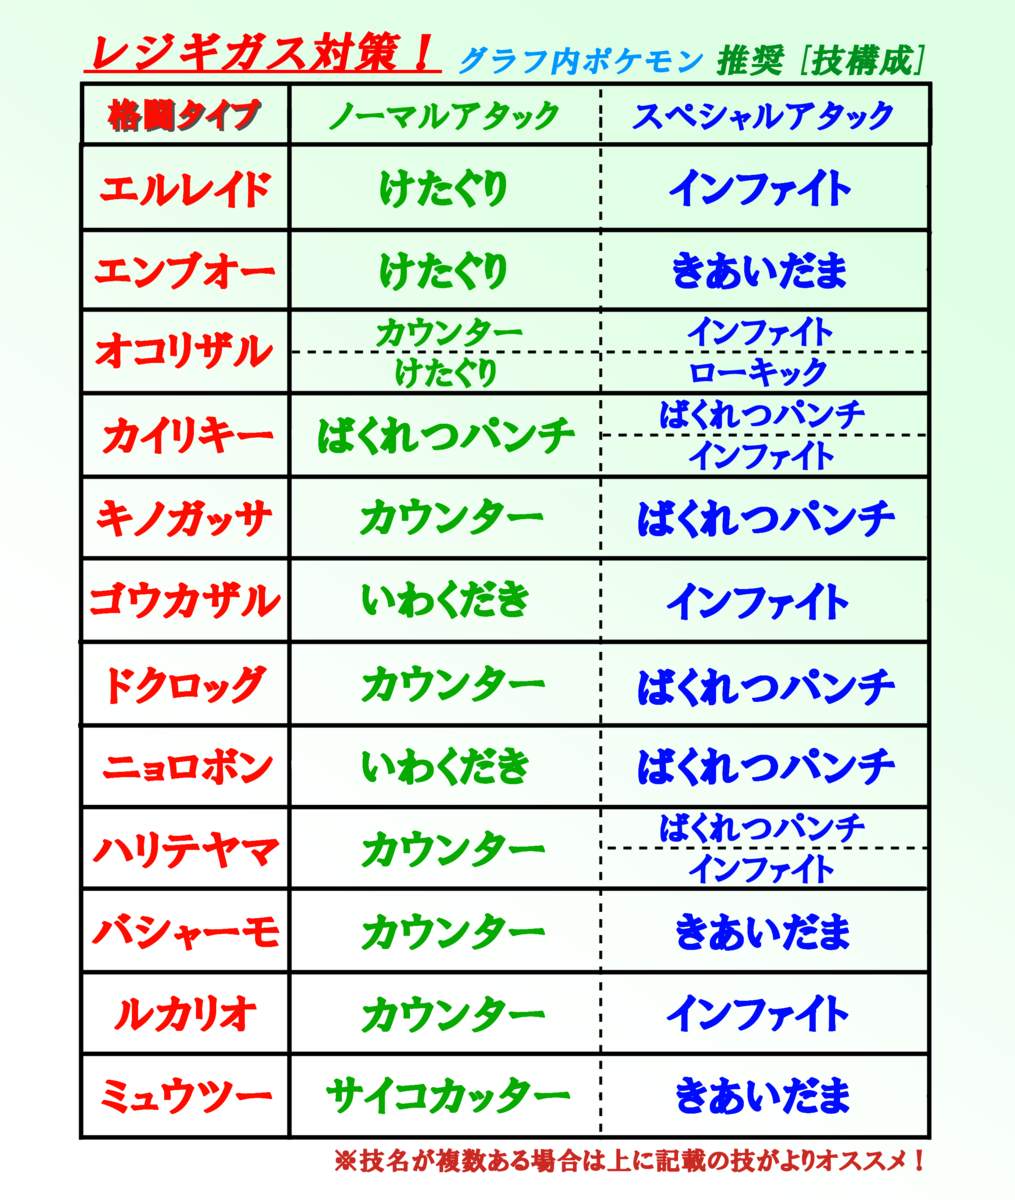 f:id:Kazumin0331:20191119024902p:plain